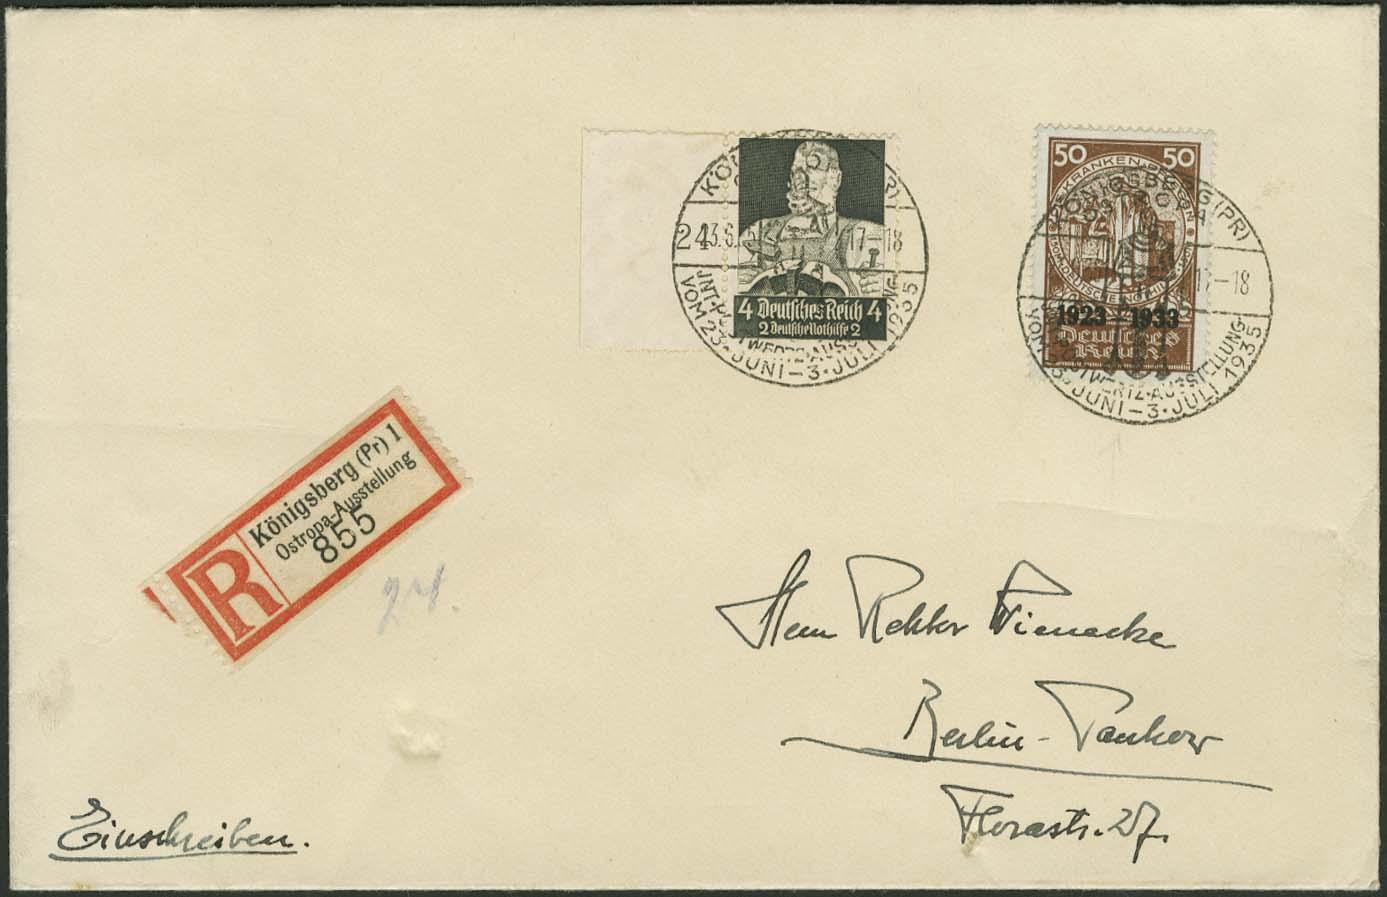 Lot 5091 - Deutsches Reich drittes reich -  Auktionshaus Ulrich Felzmann GmbH & Co. KG Auction #161 Philatelic & Numismatic